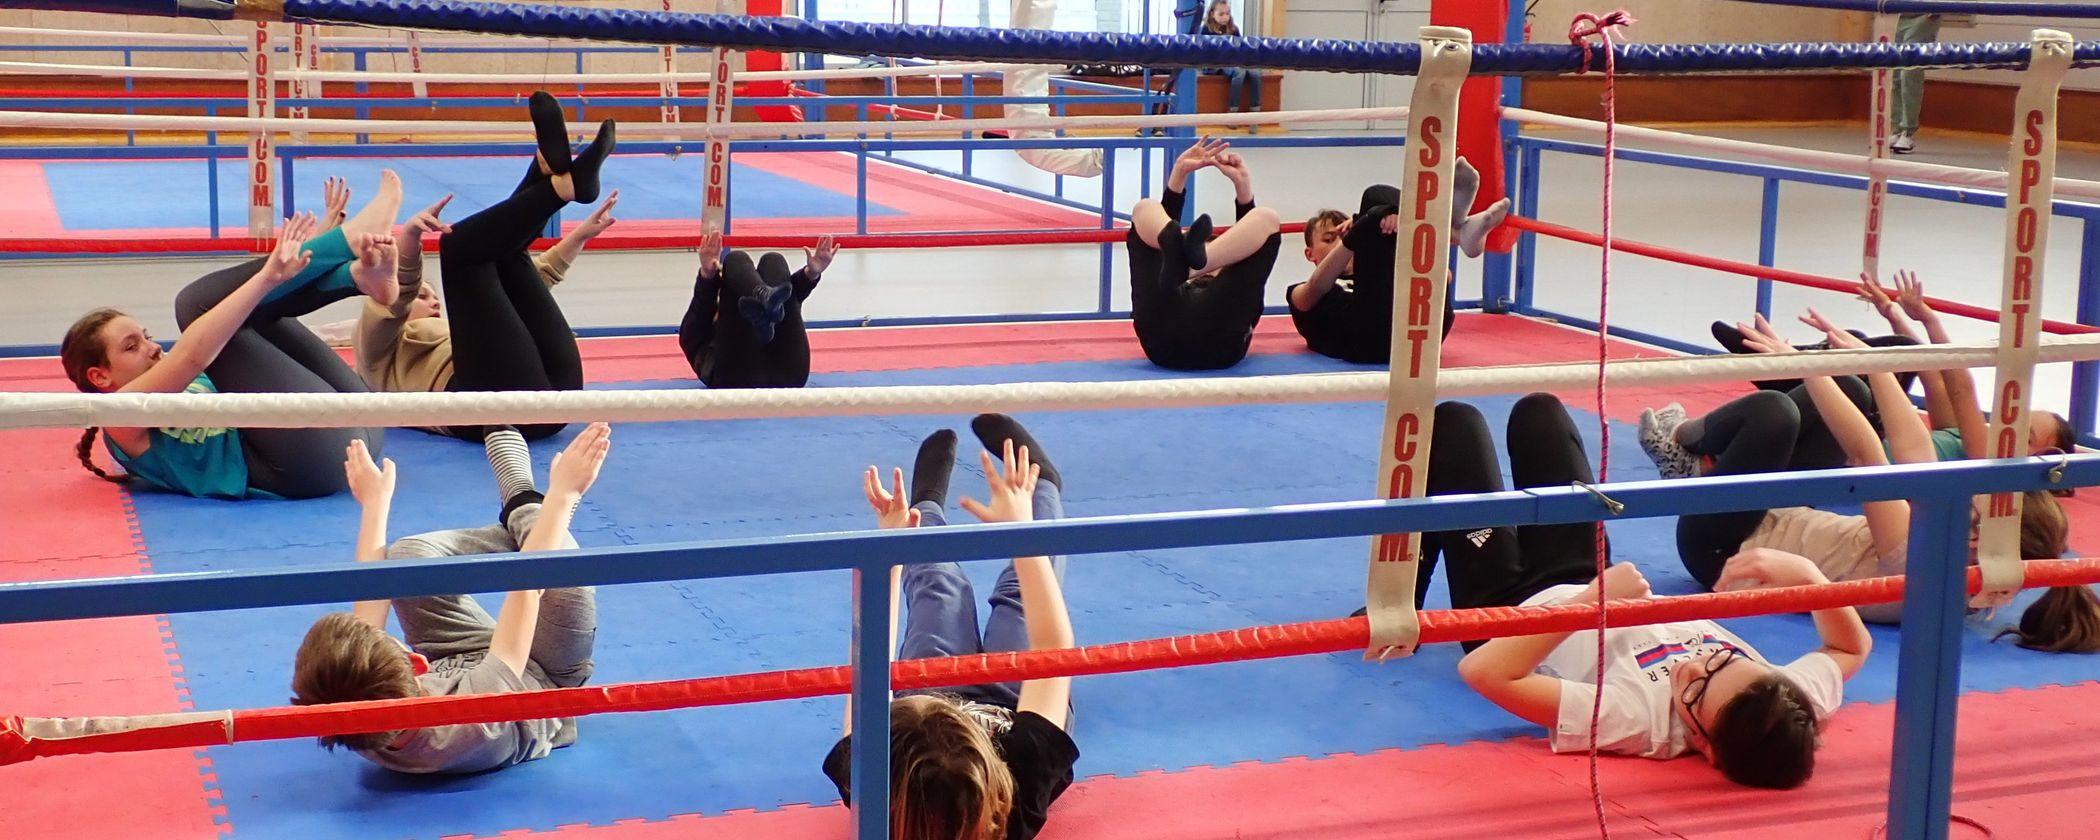 boxing club malouin Saint-Malo